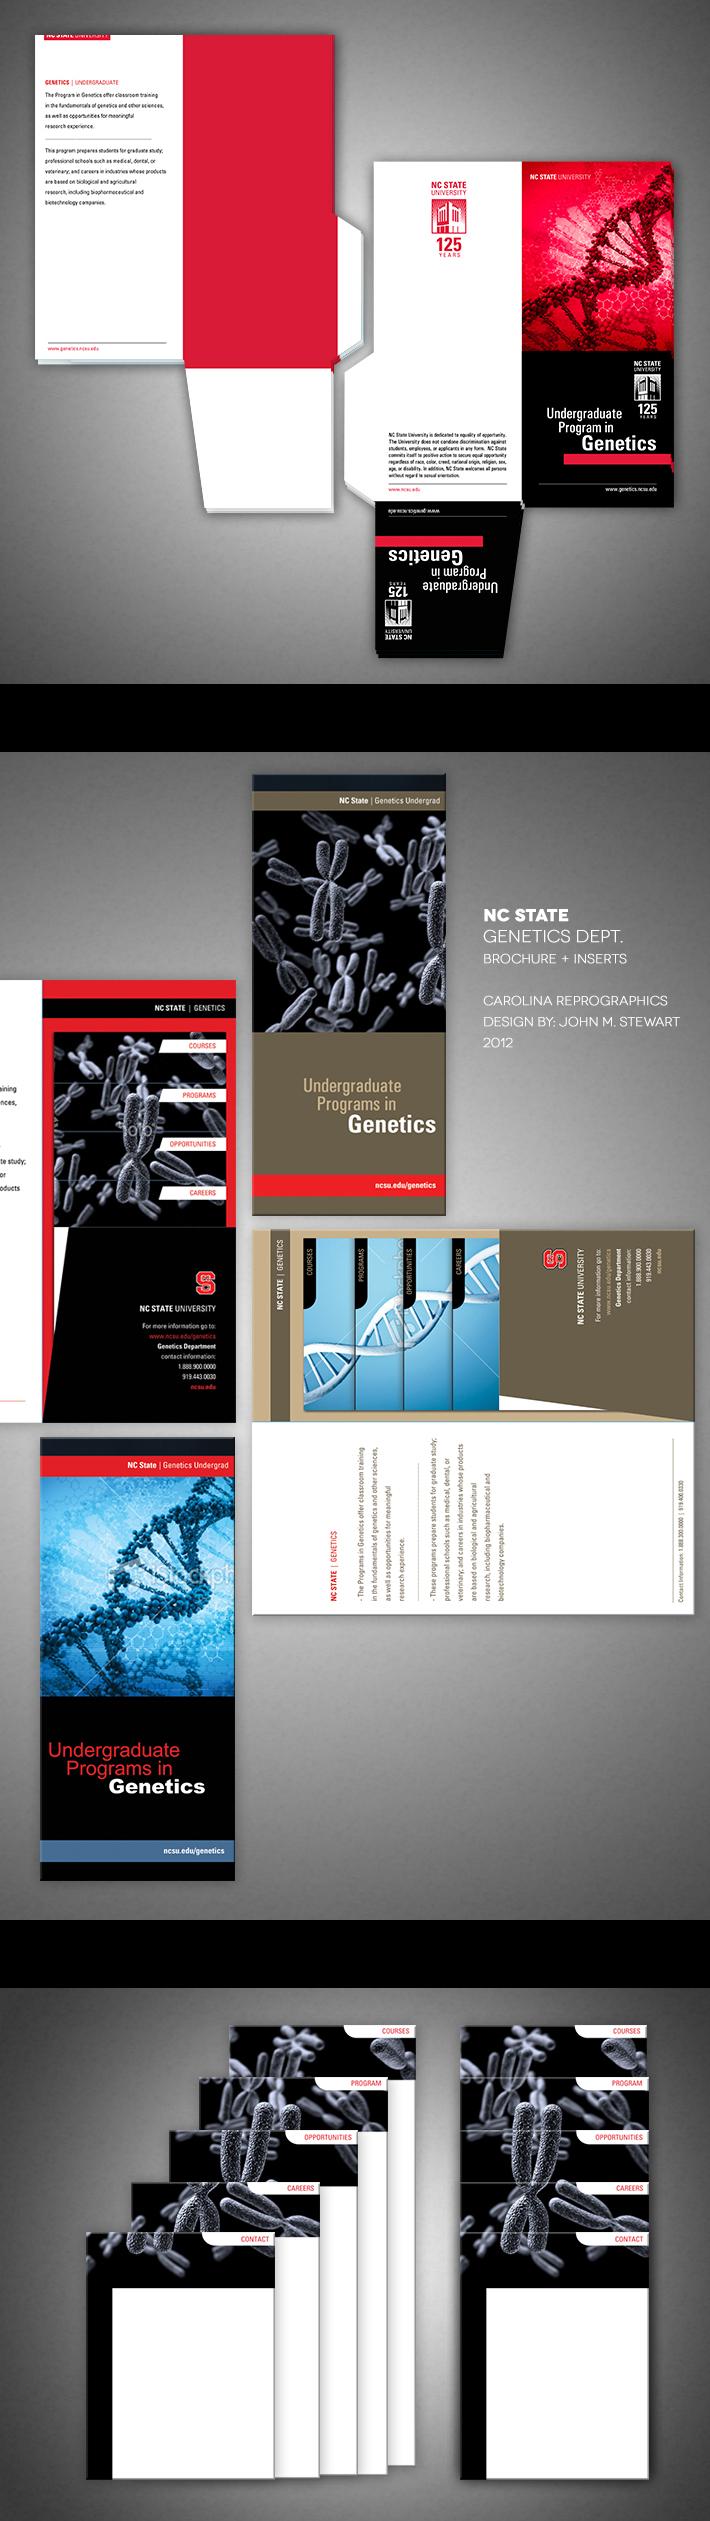 nc-state-genetics_post-graphic